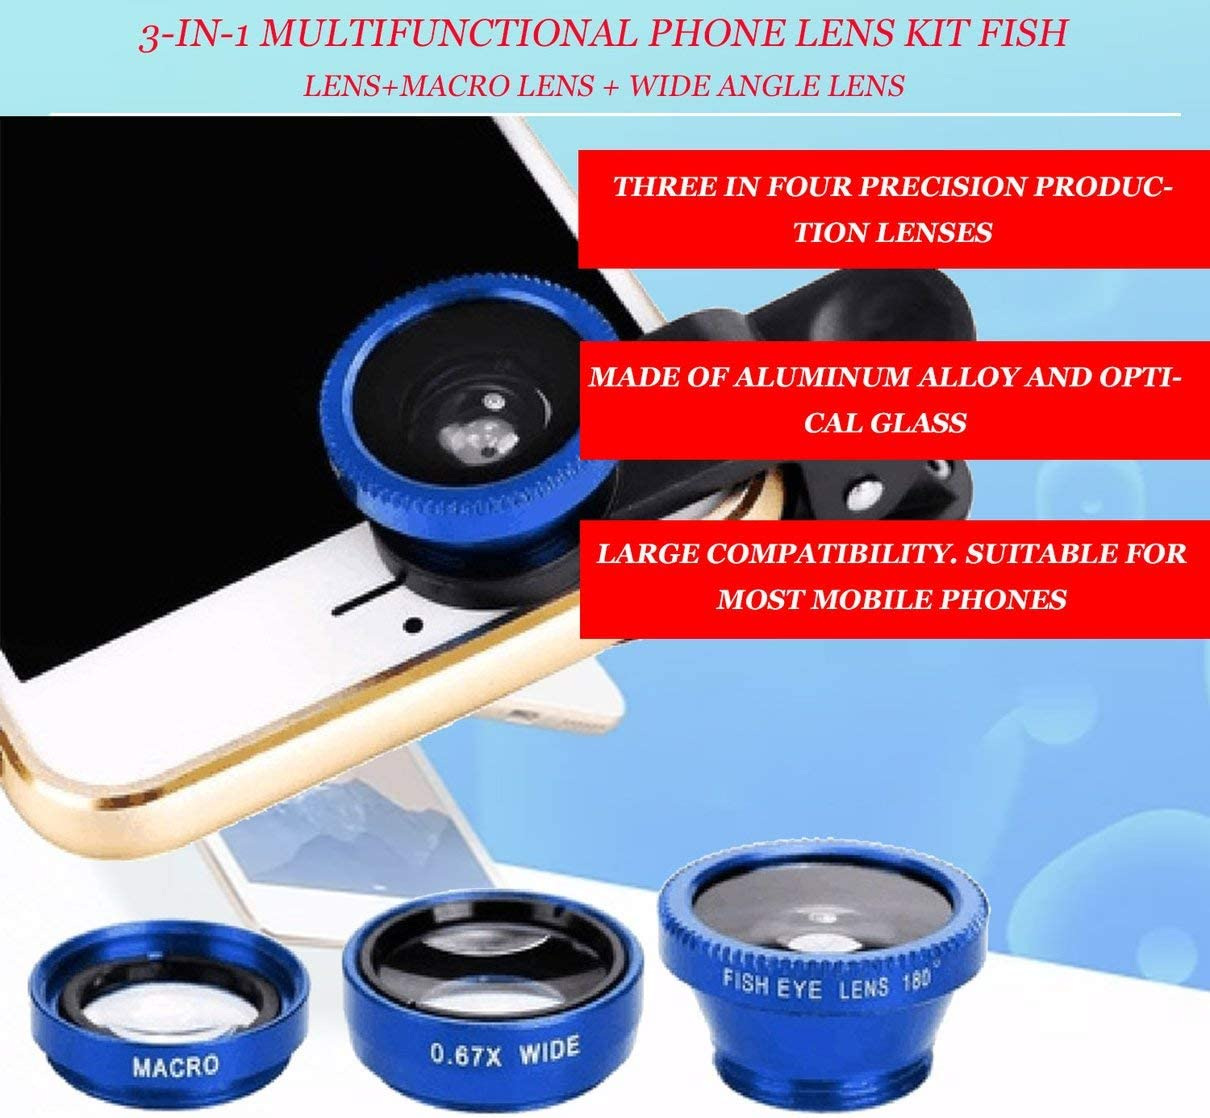 Wide Angle Lens Transform Phone Into Professional Camera 3-in-1 Multifunctional Phone Lens Kit Fish Lens+Macro Lens